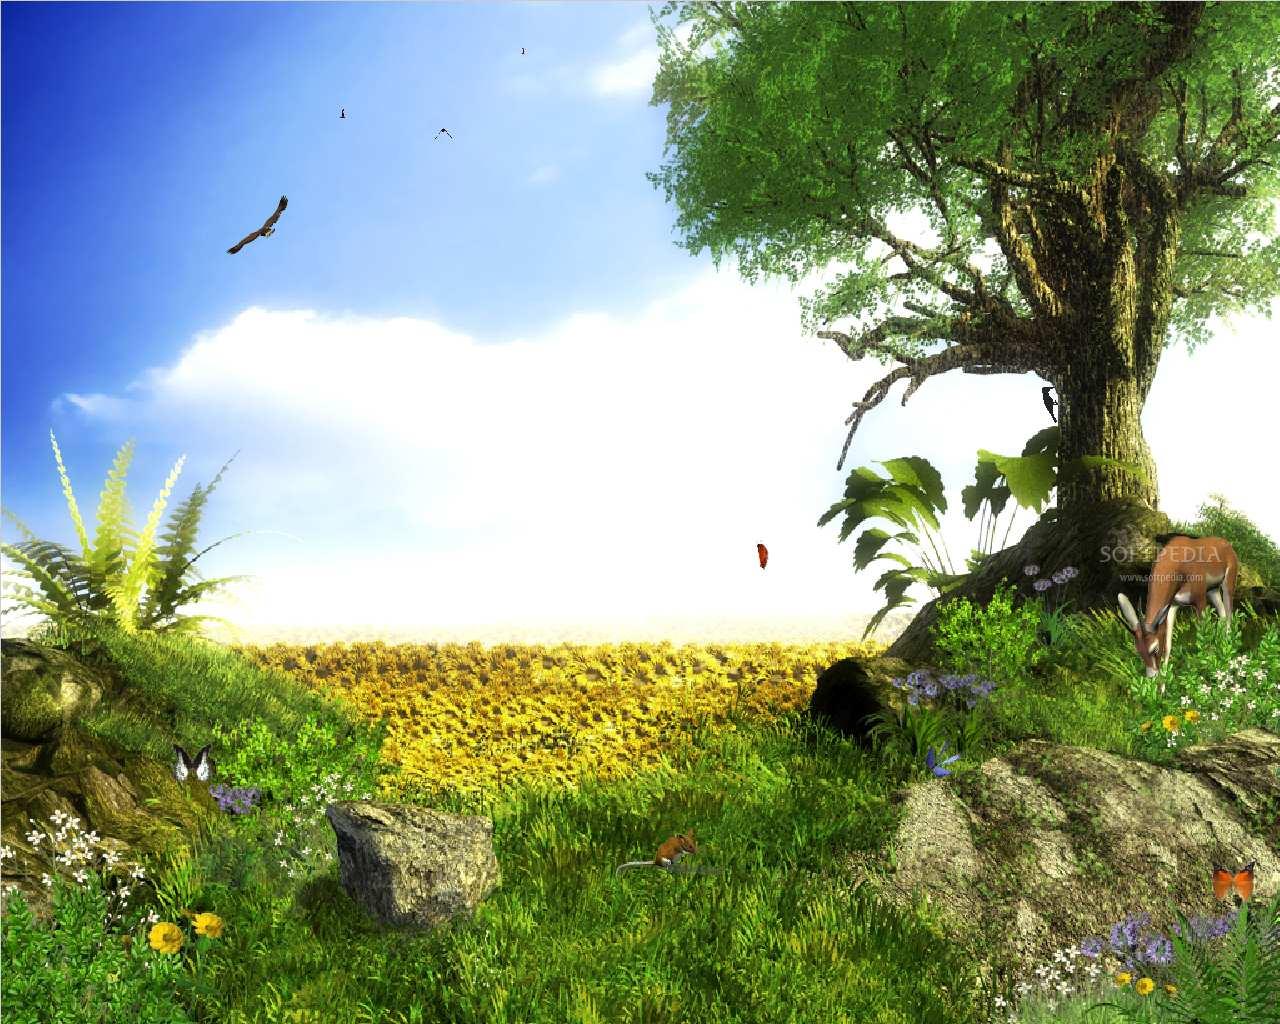 Animated Desktop Animated Desktop Wallpaper for Mac 3d Animated 1280x1024